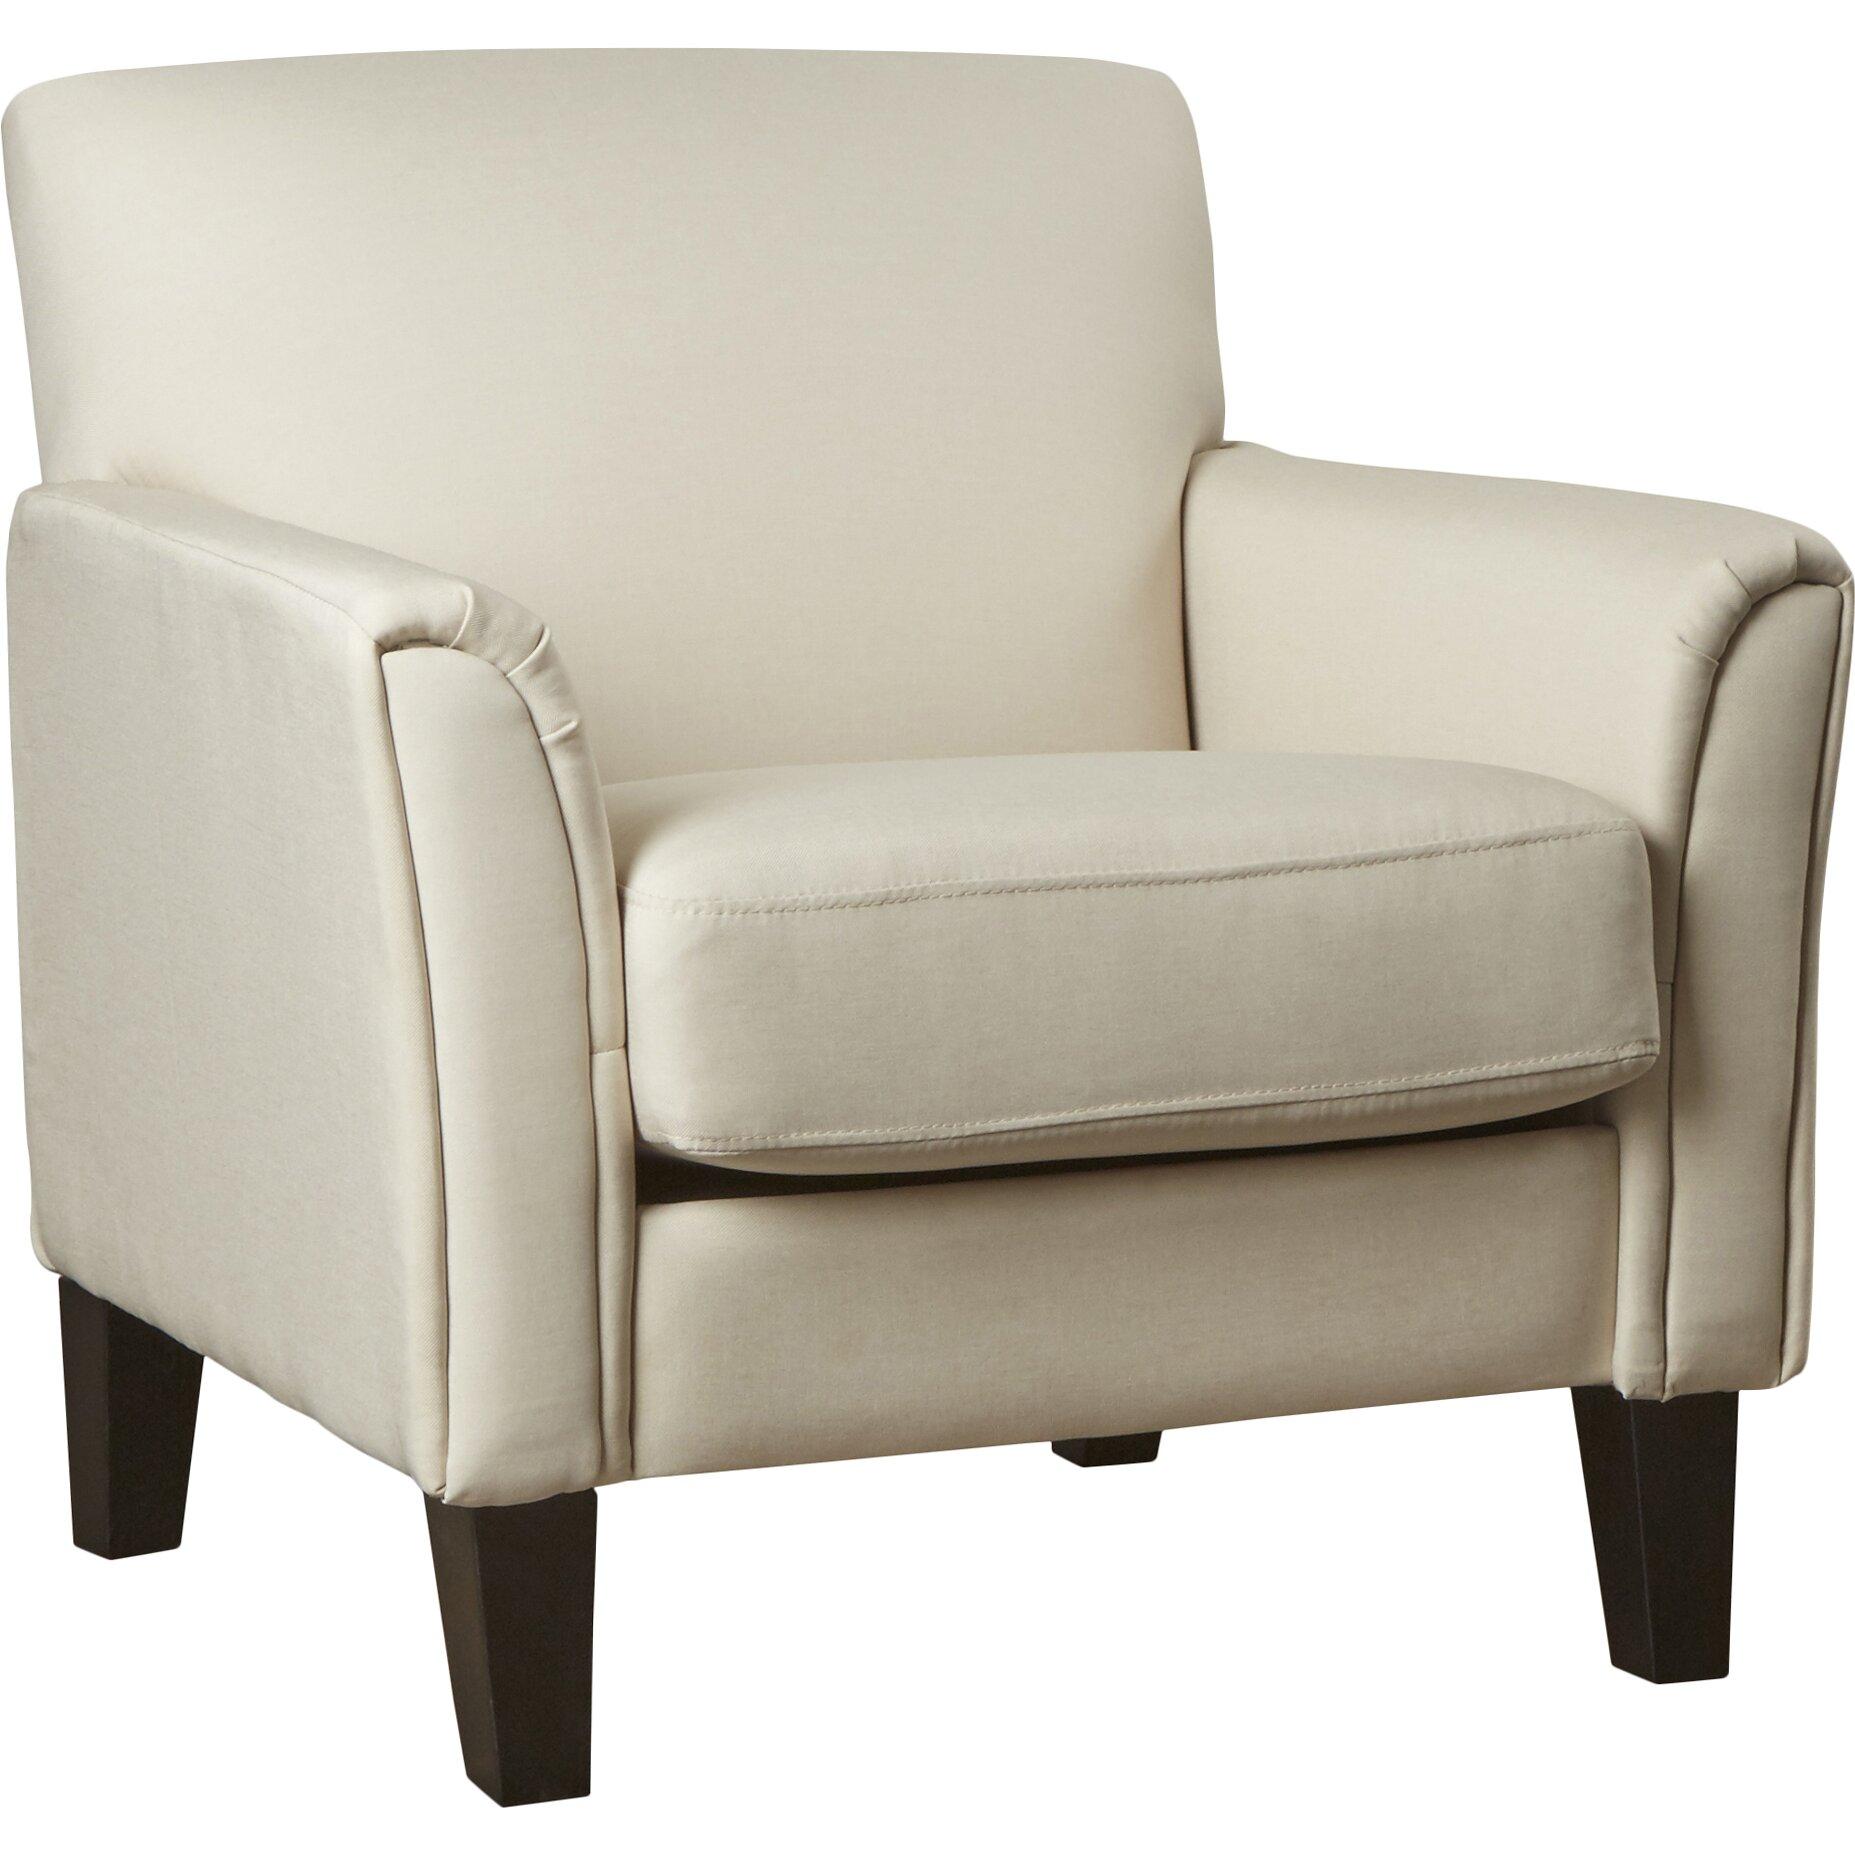 Darby Home Co Crawford Modern Arm Chair Reviews Wayfair